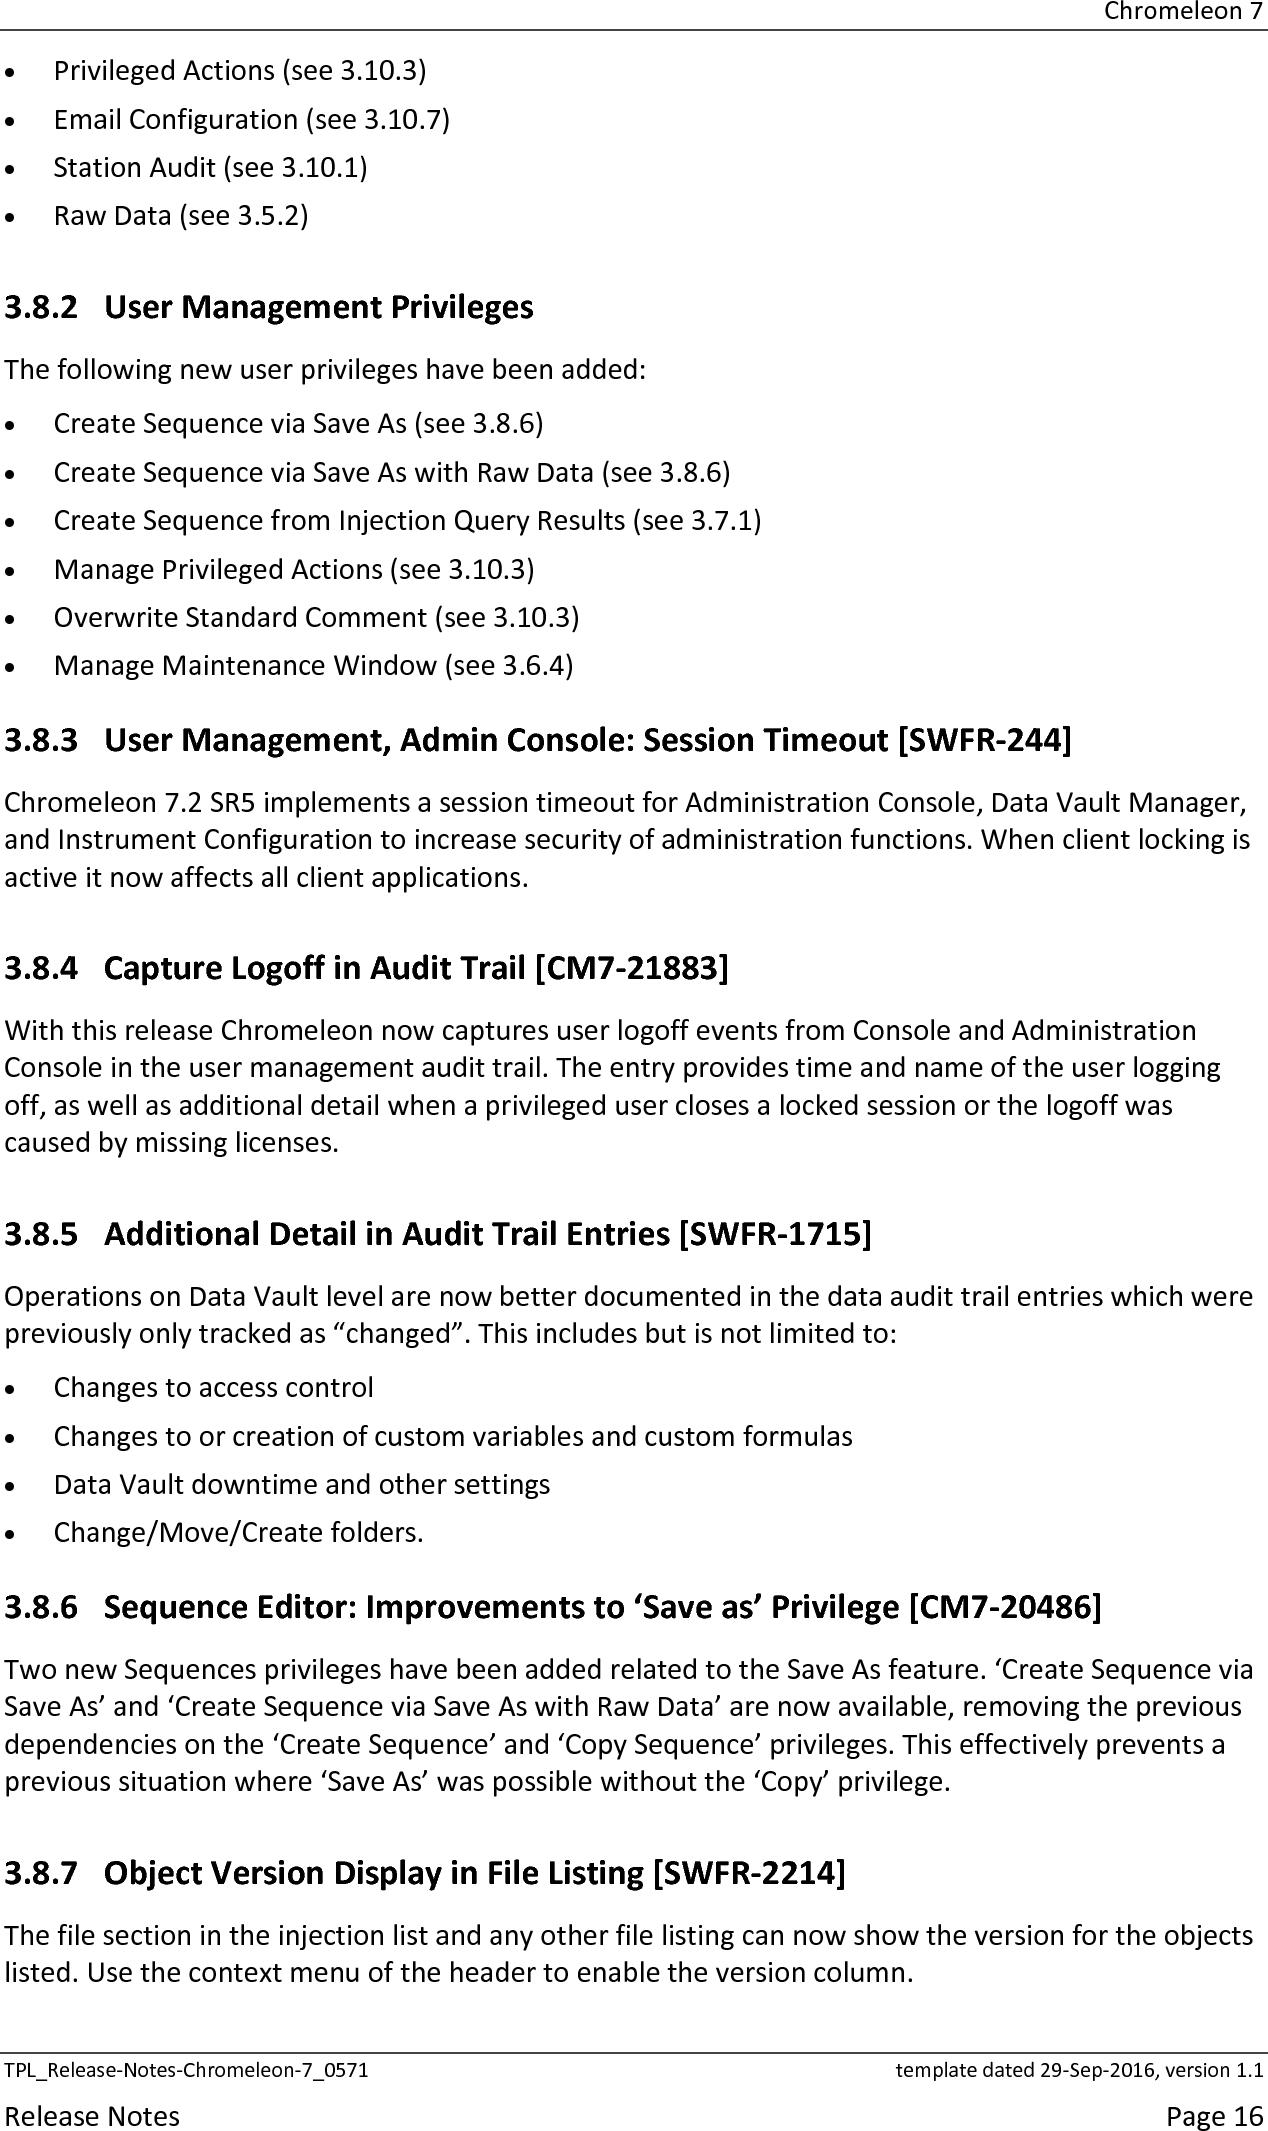 Release Notes Chromeleon 7 2 Sr5 Pdf User Manual